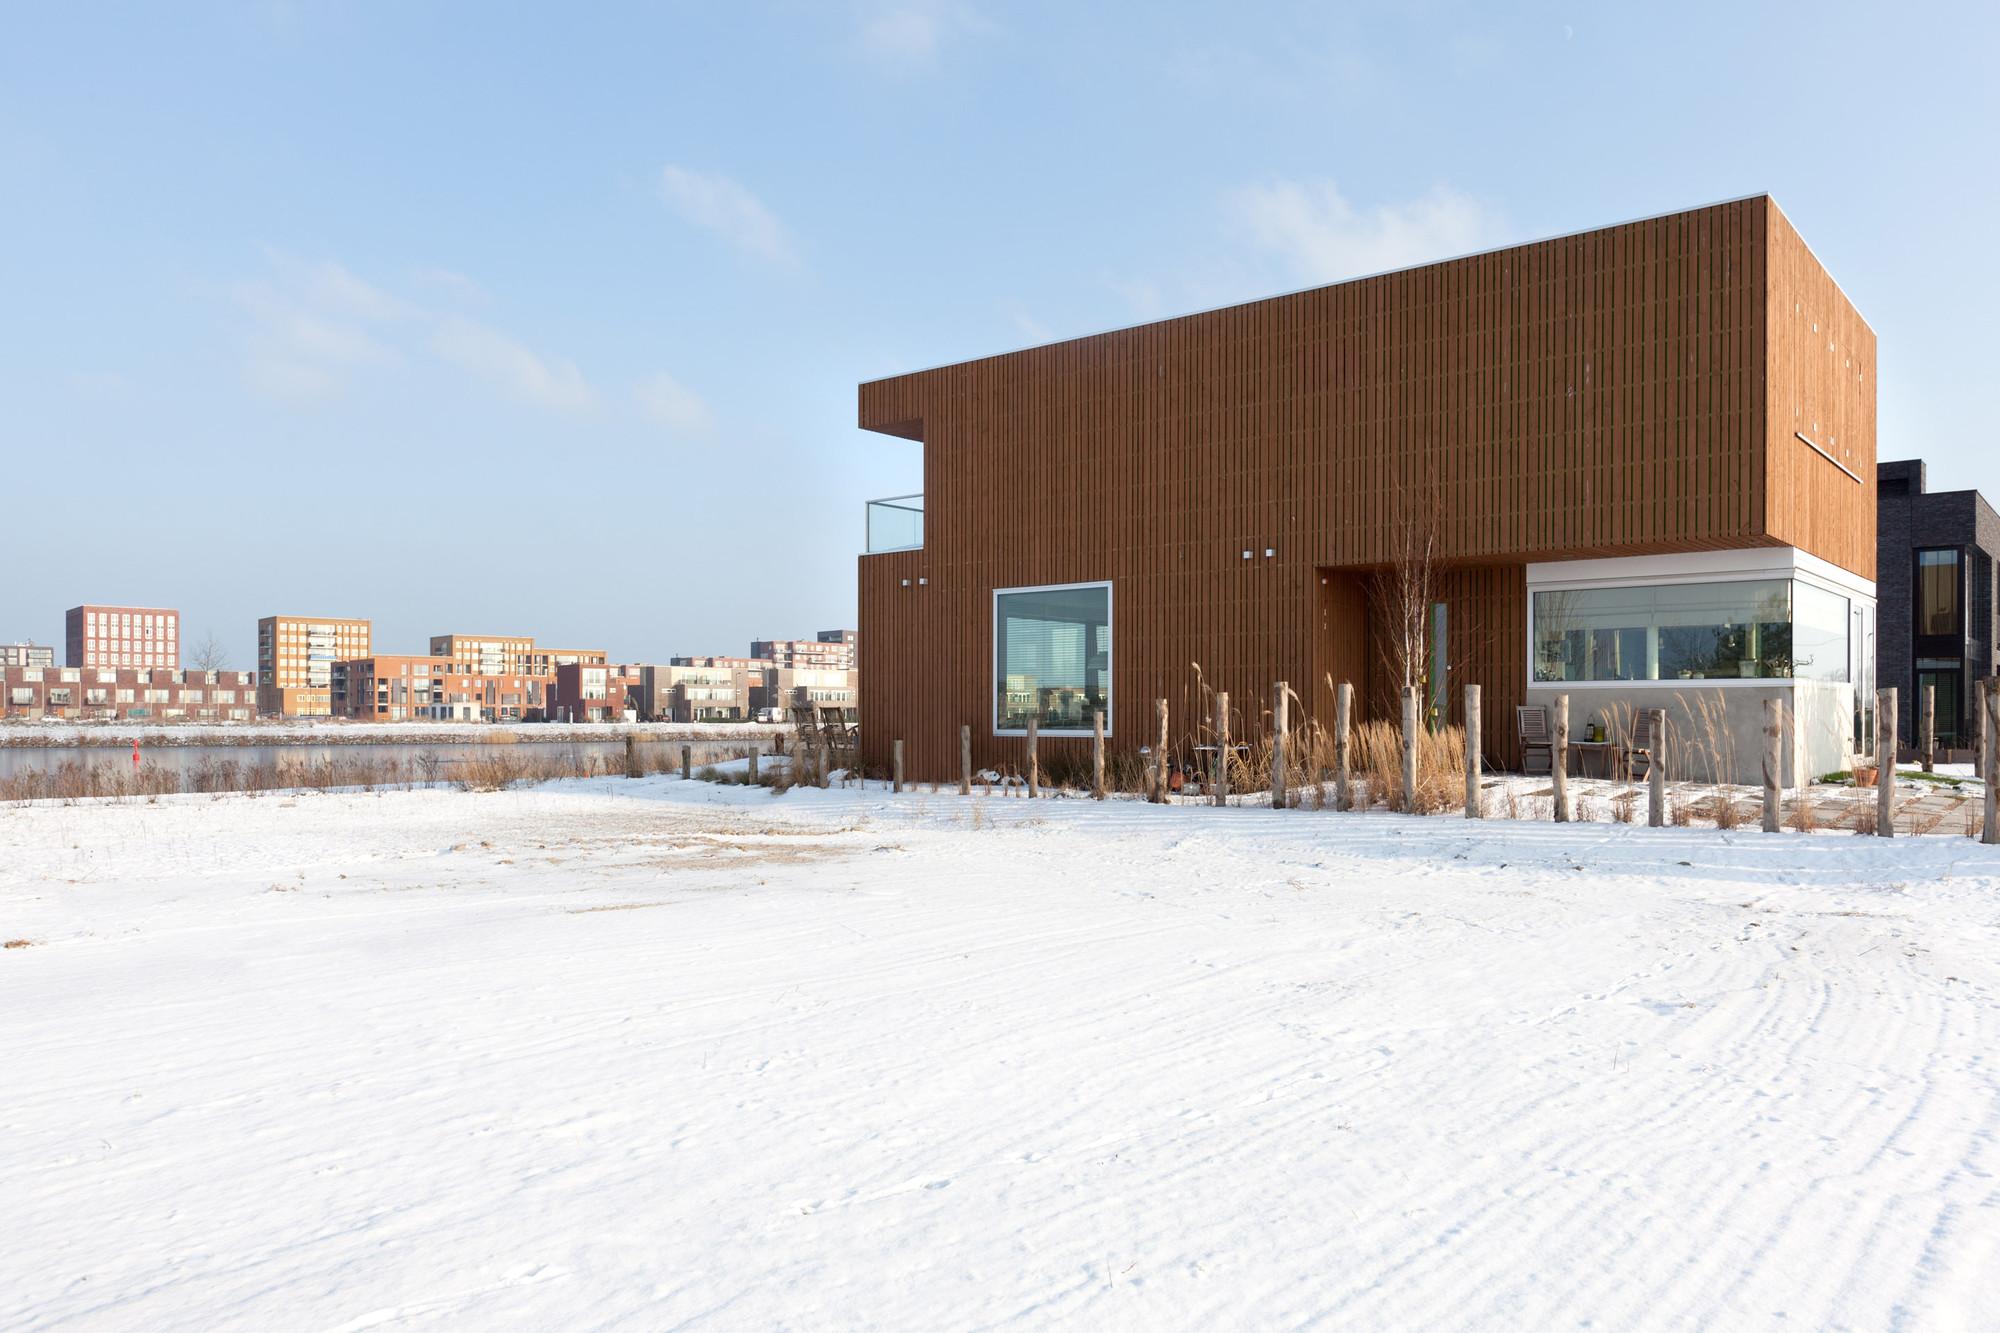 IJburg Villa  / Marc Prosman Architecten, © Milad Pallesh